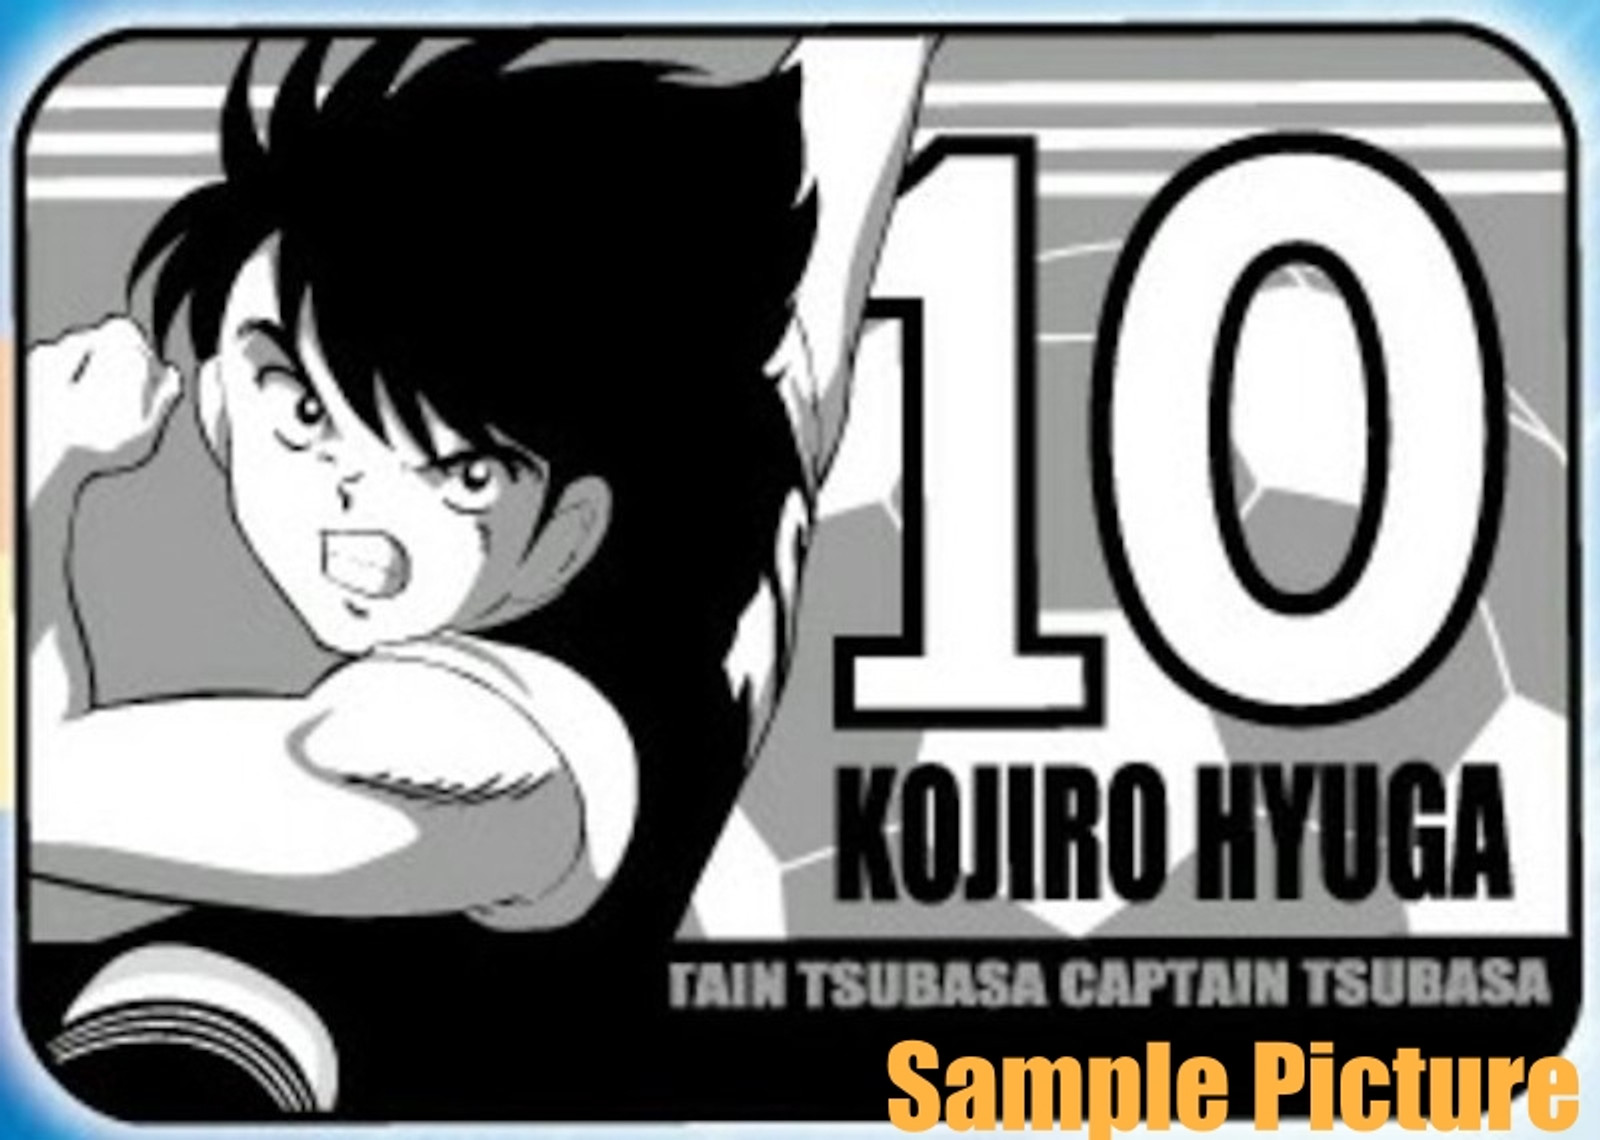 Captain Tsubasa Kojiro Hyuga Blanket 100x70cm (39x28inch) JAPAN ANIME MANGA